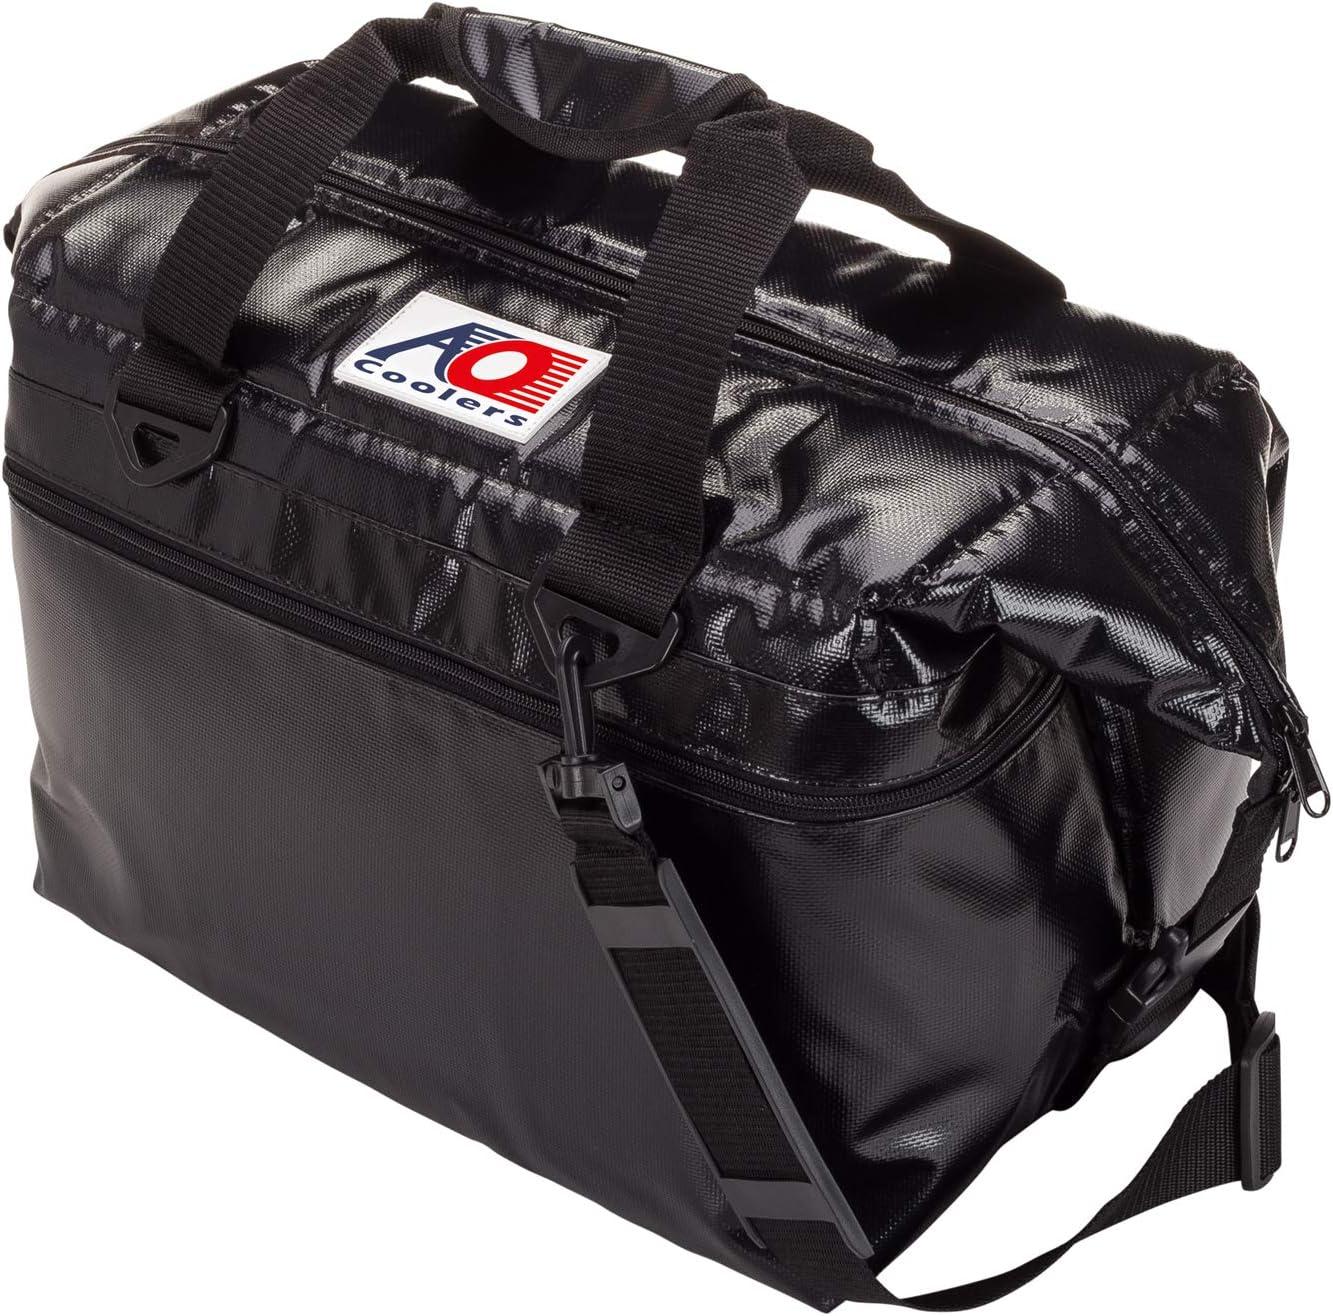 AO Coolers(エーオークーラー) ビニール ソフトクーラー バッグ 24パック 各色 耐水 軽量 保冷 クーラーボックス (日本正規品) ブラック